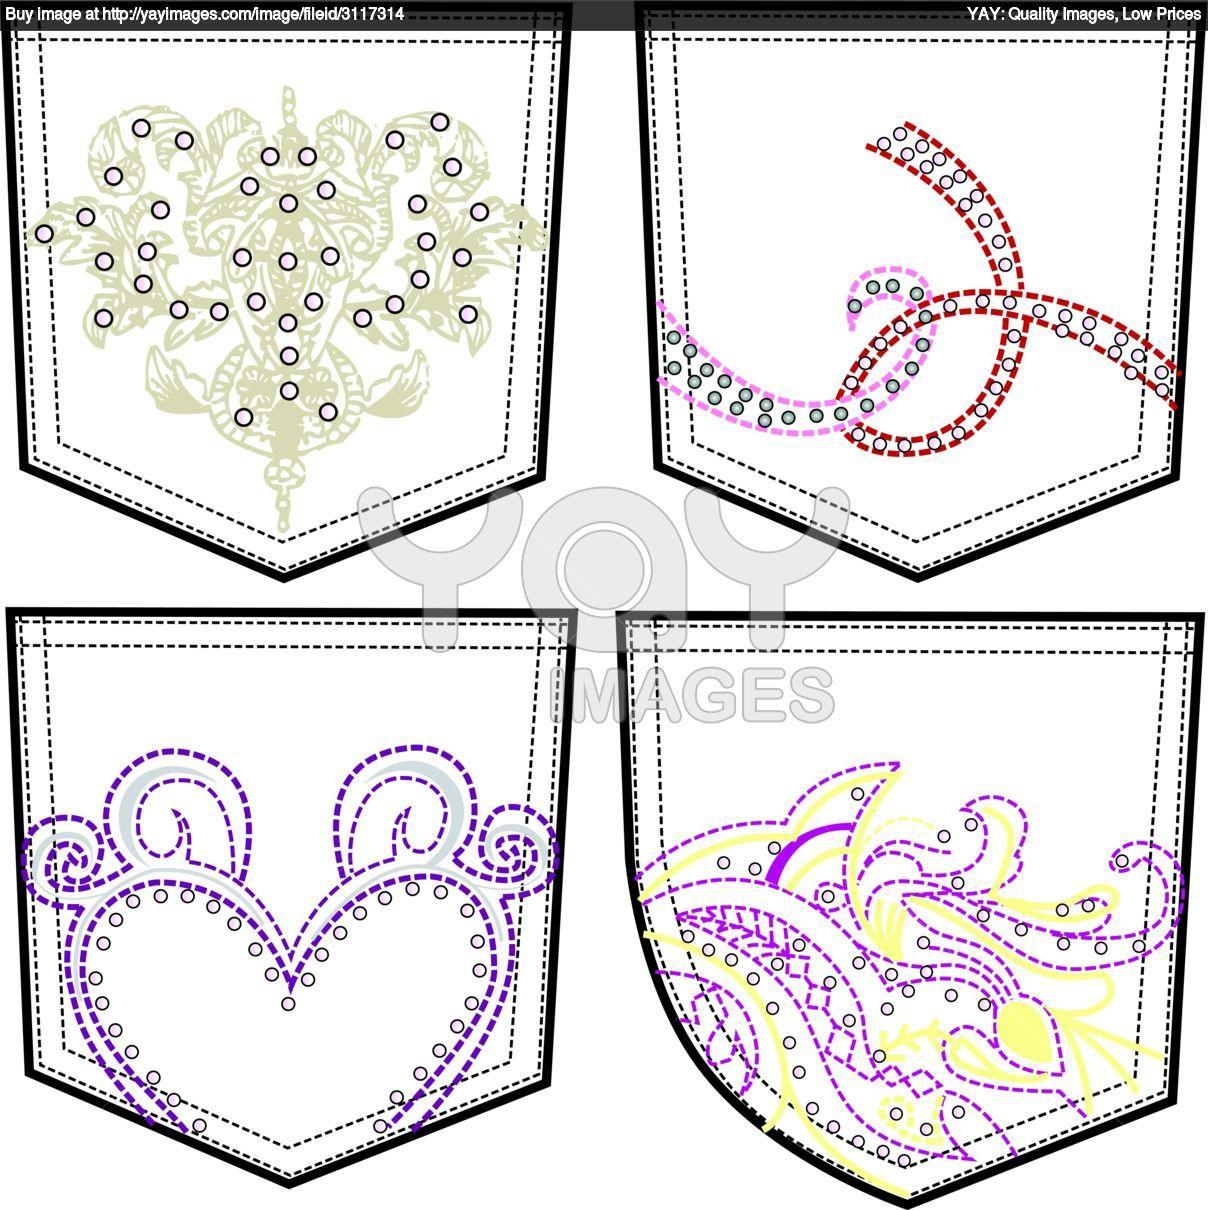 Free Rhinestone Template Downloads | back pockets with stitching and rhinestone